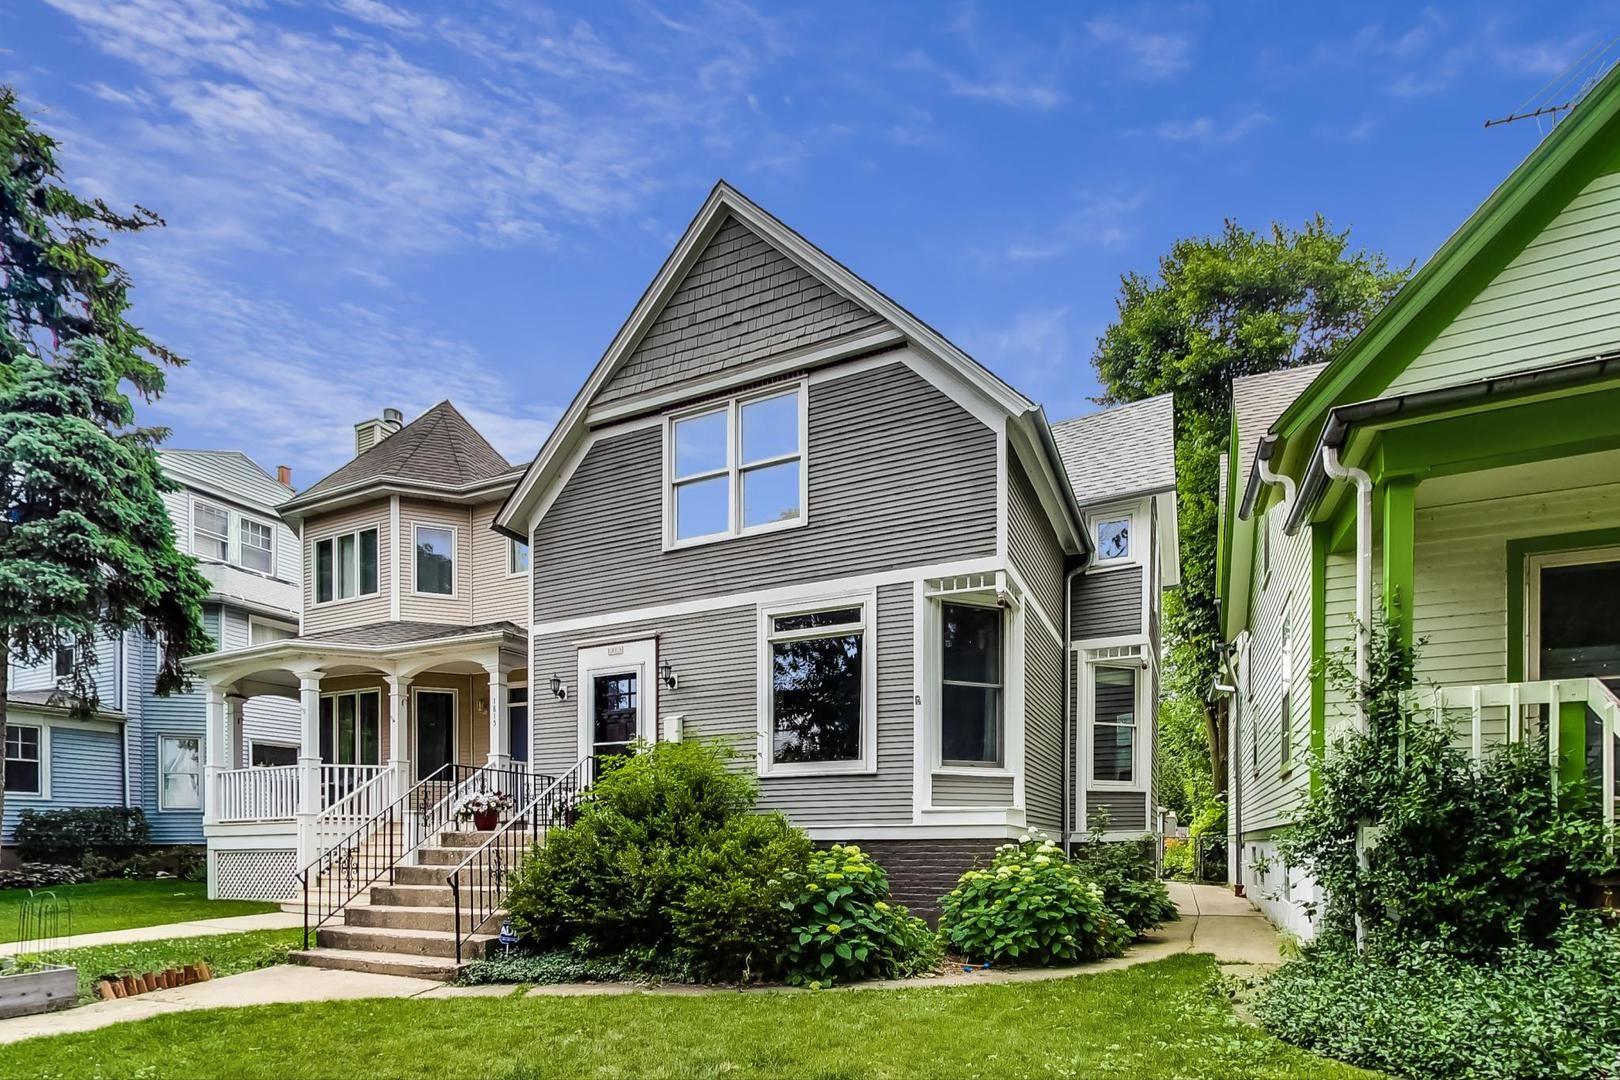 1813 Ashland Avenue, Evanston, IL 60201 - #: 10759361